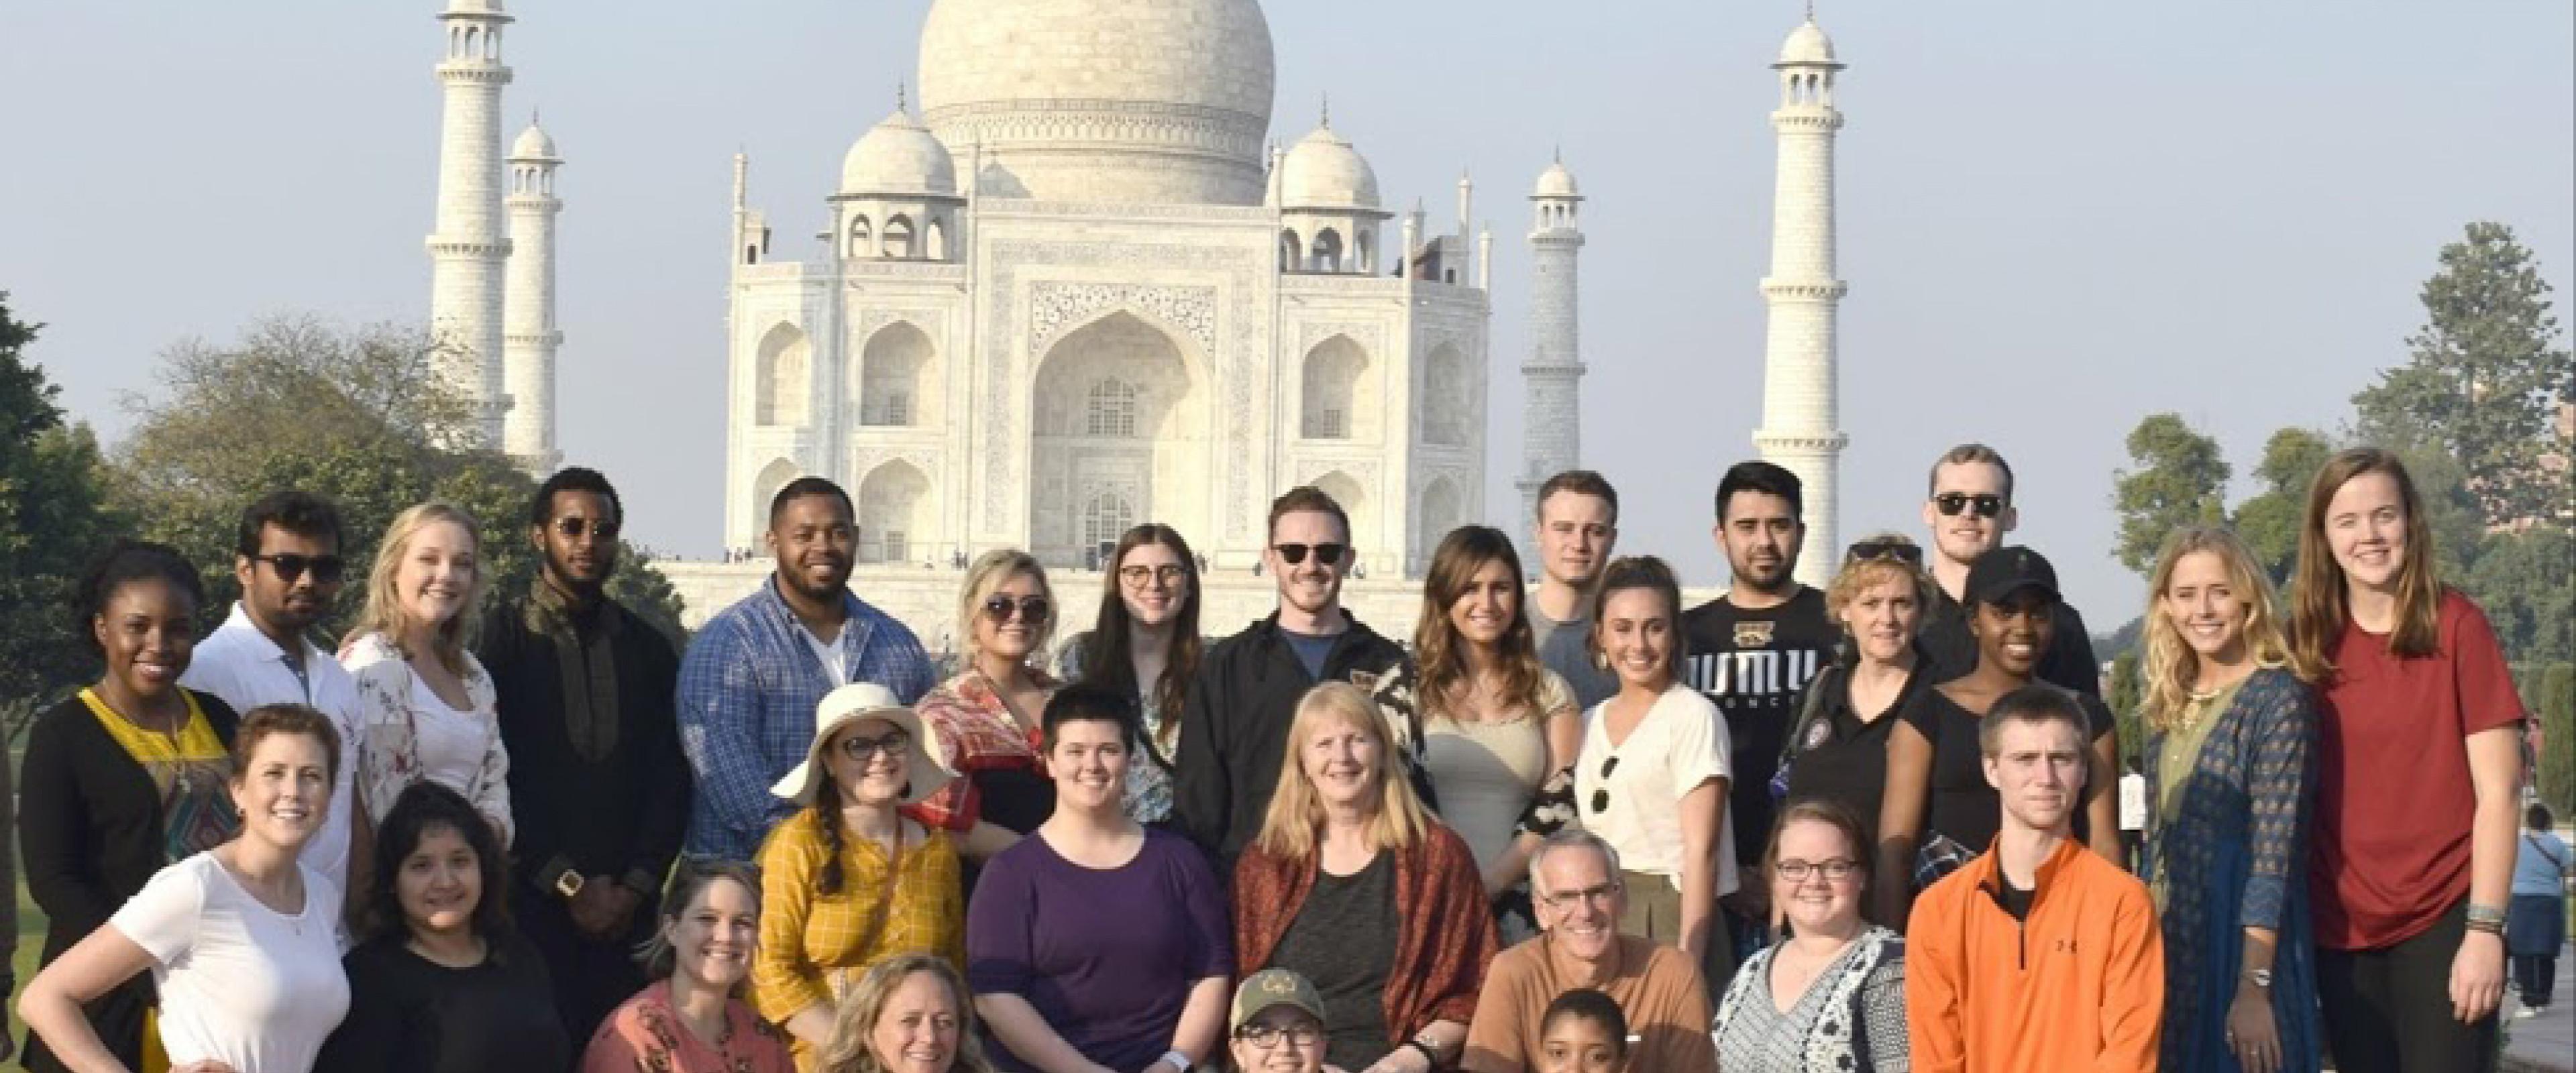 students in front of Taj Mahal